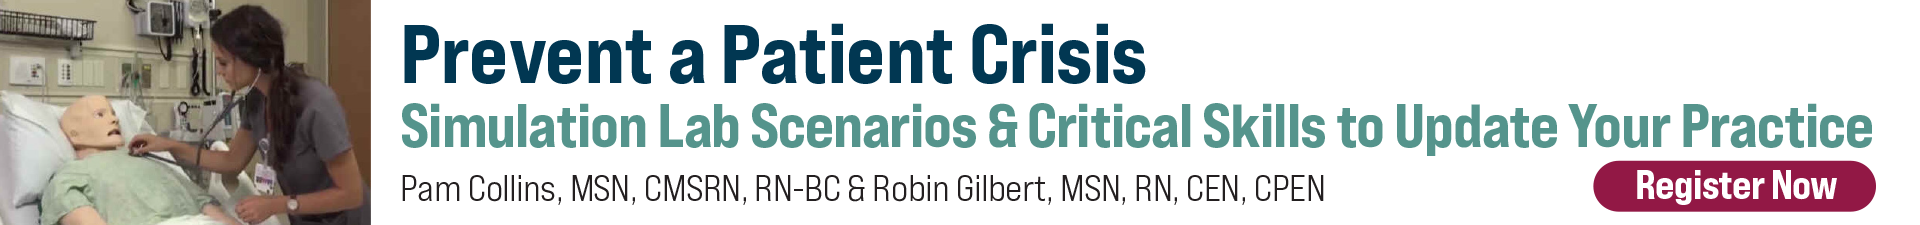 Prevent a Patient Crisis: Simulation Lab Scenarios & Critical Skills to Update Your Practice